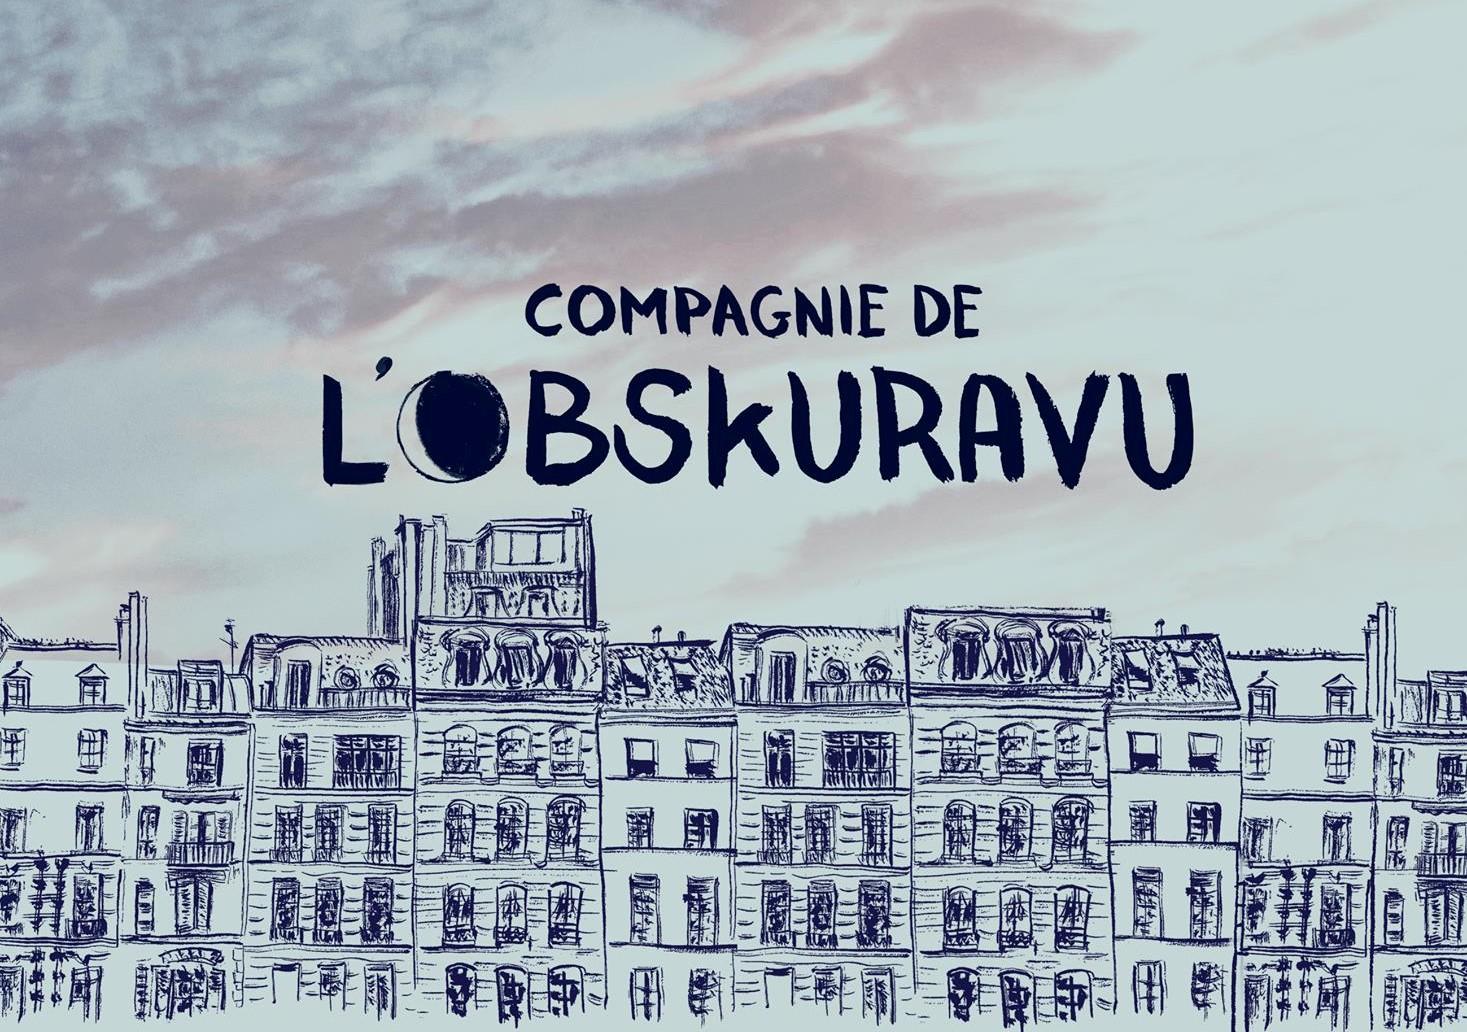 Compagnie de l'Obskuravu